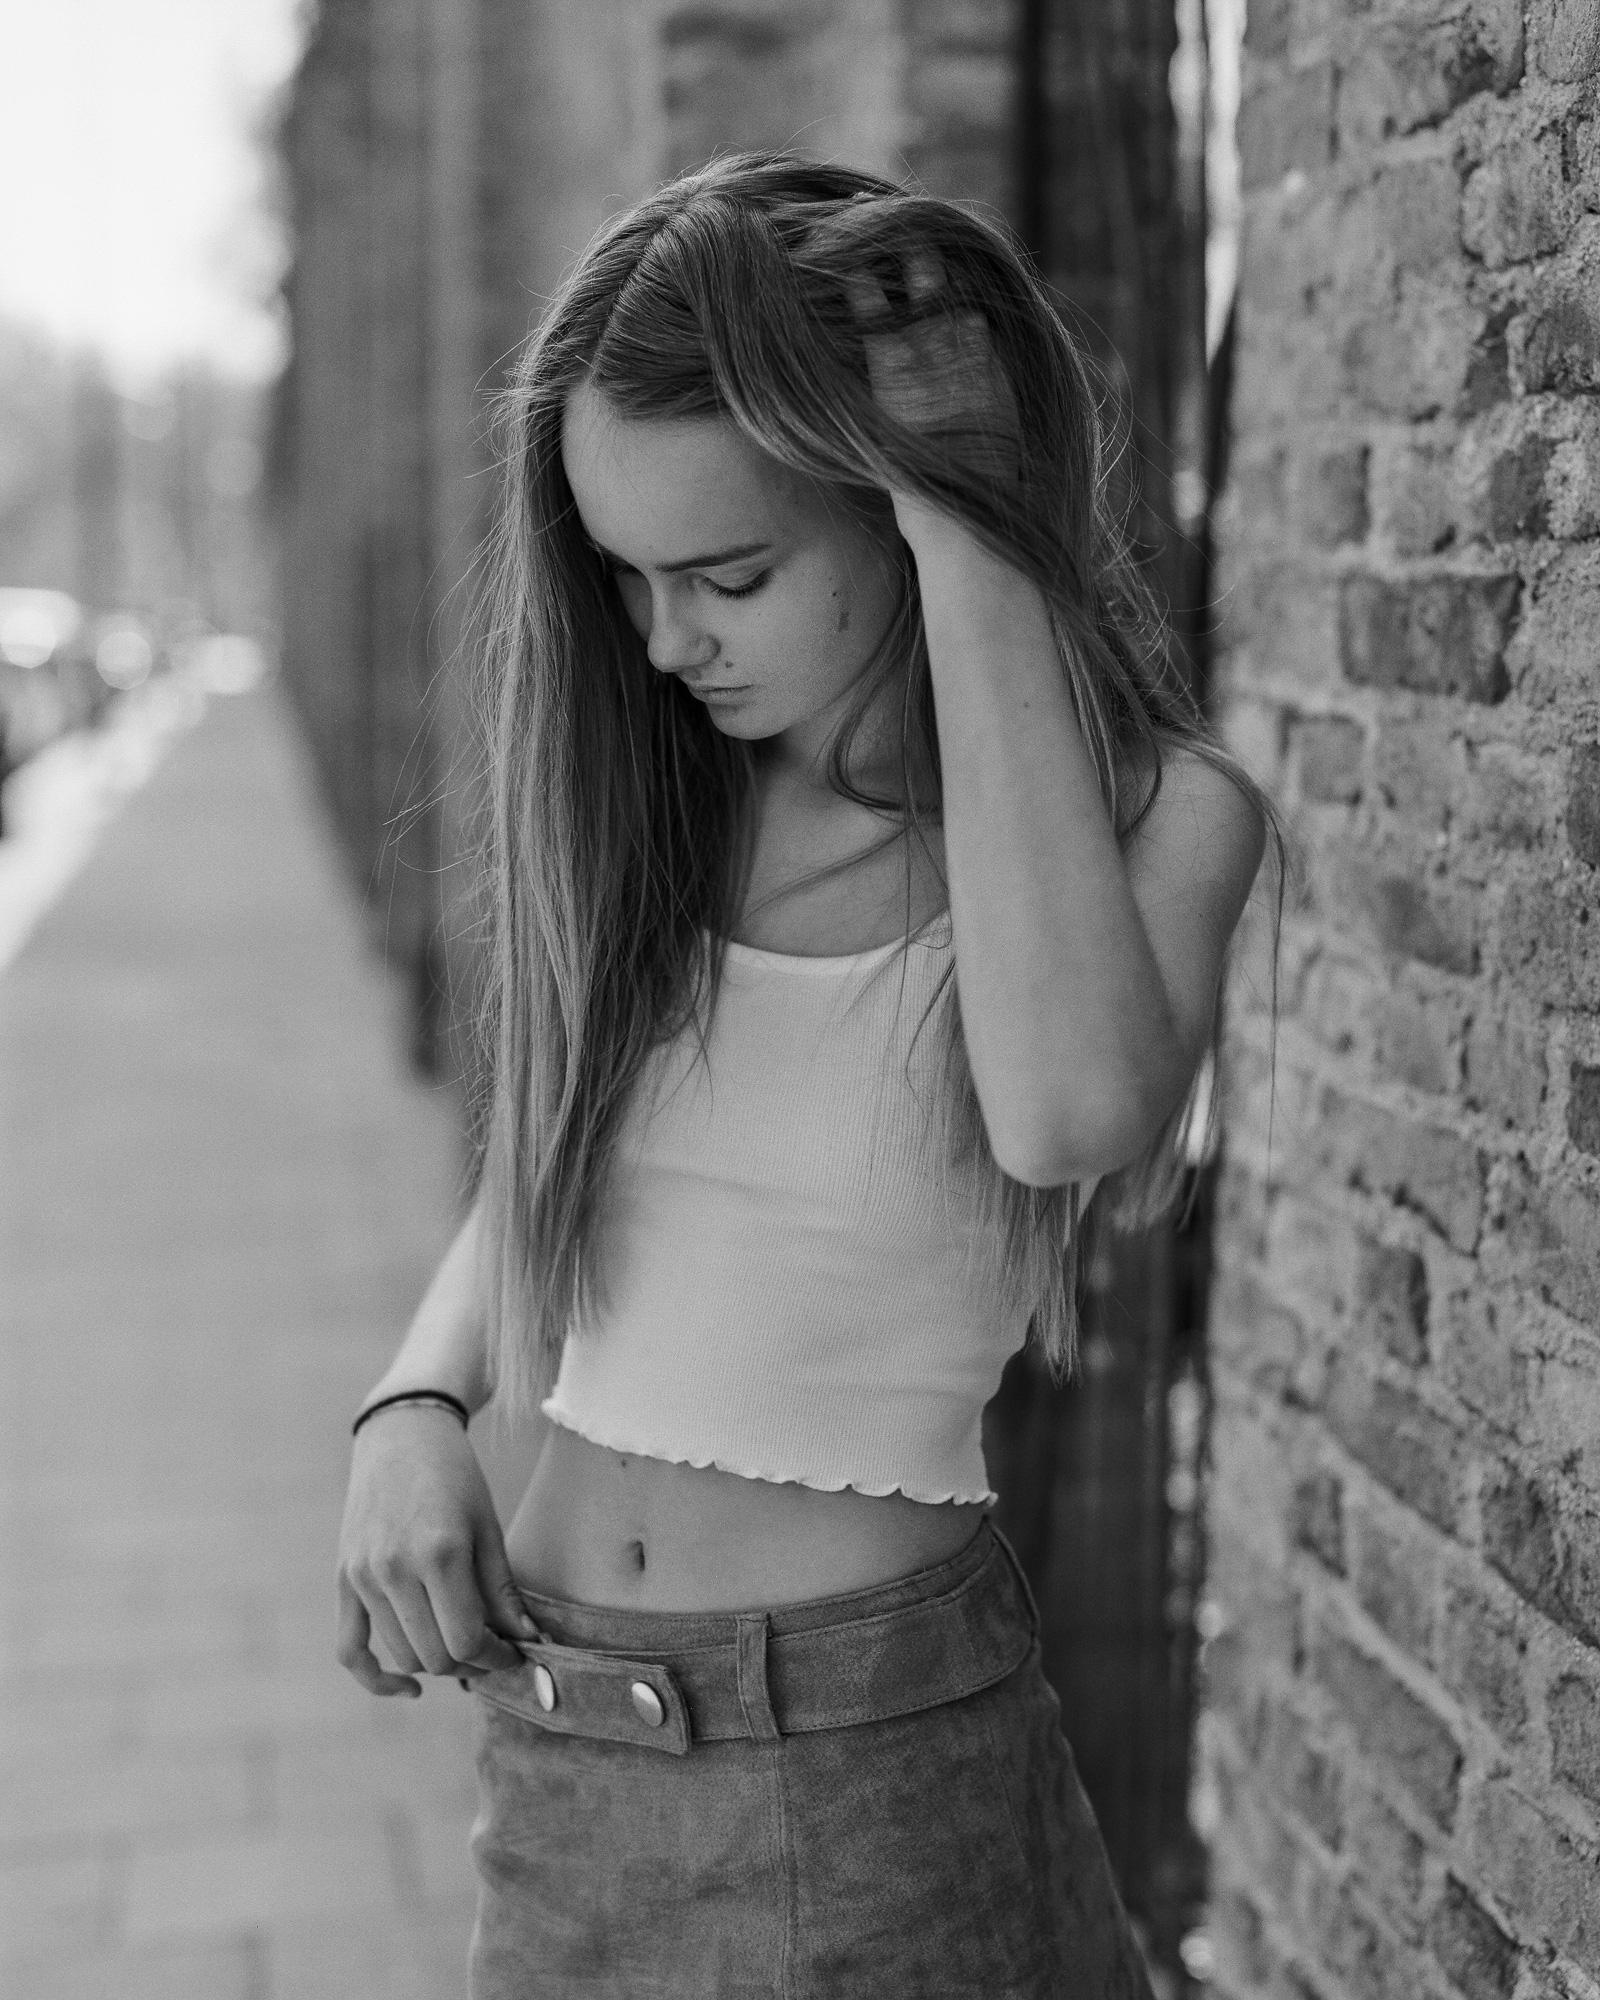 Louise_08_04_2018_Kodak_Tri-x_3_3.jpg